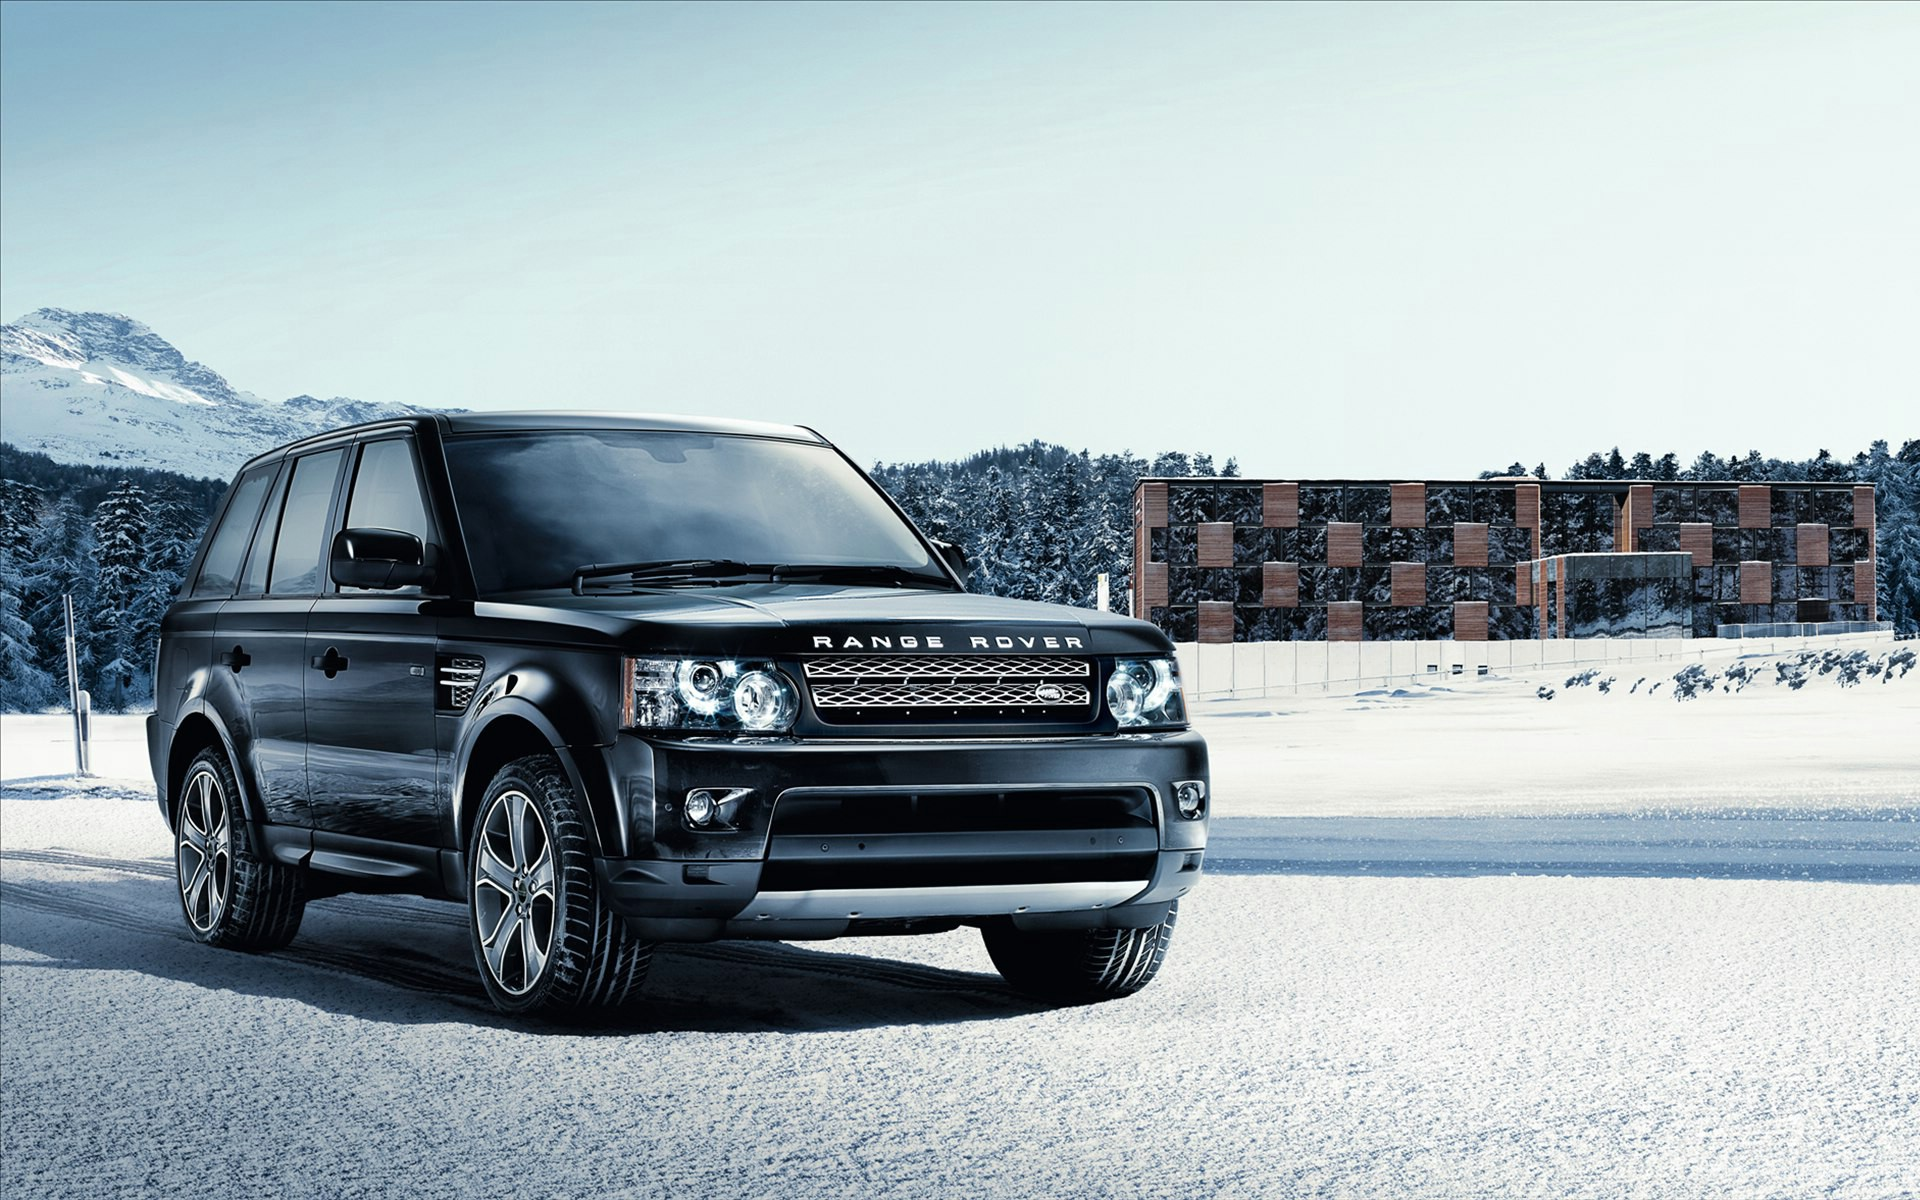 Stunning Range Rover Wallpaper